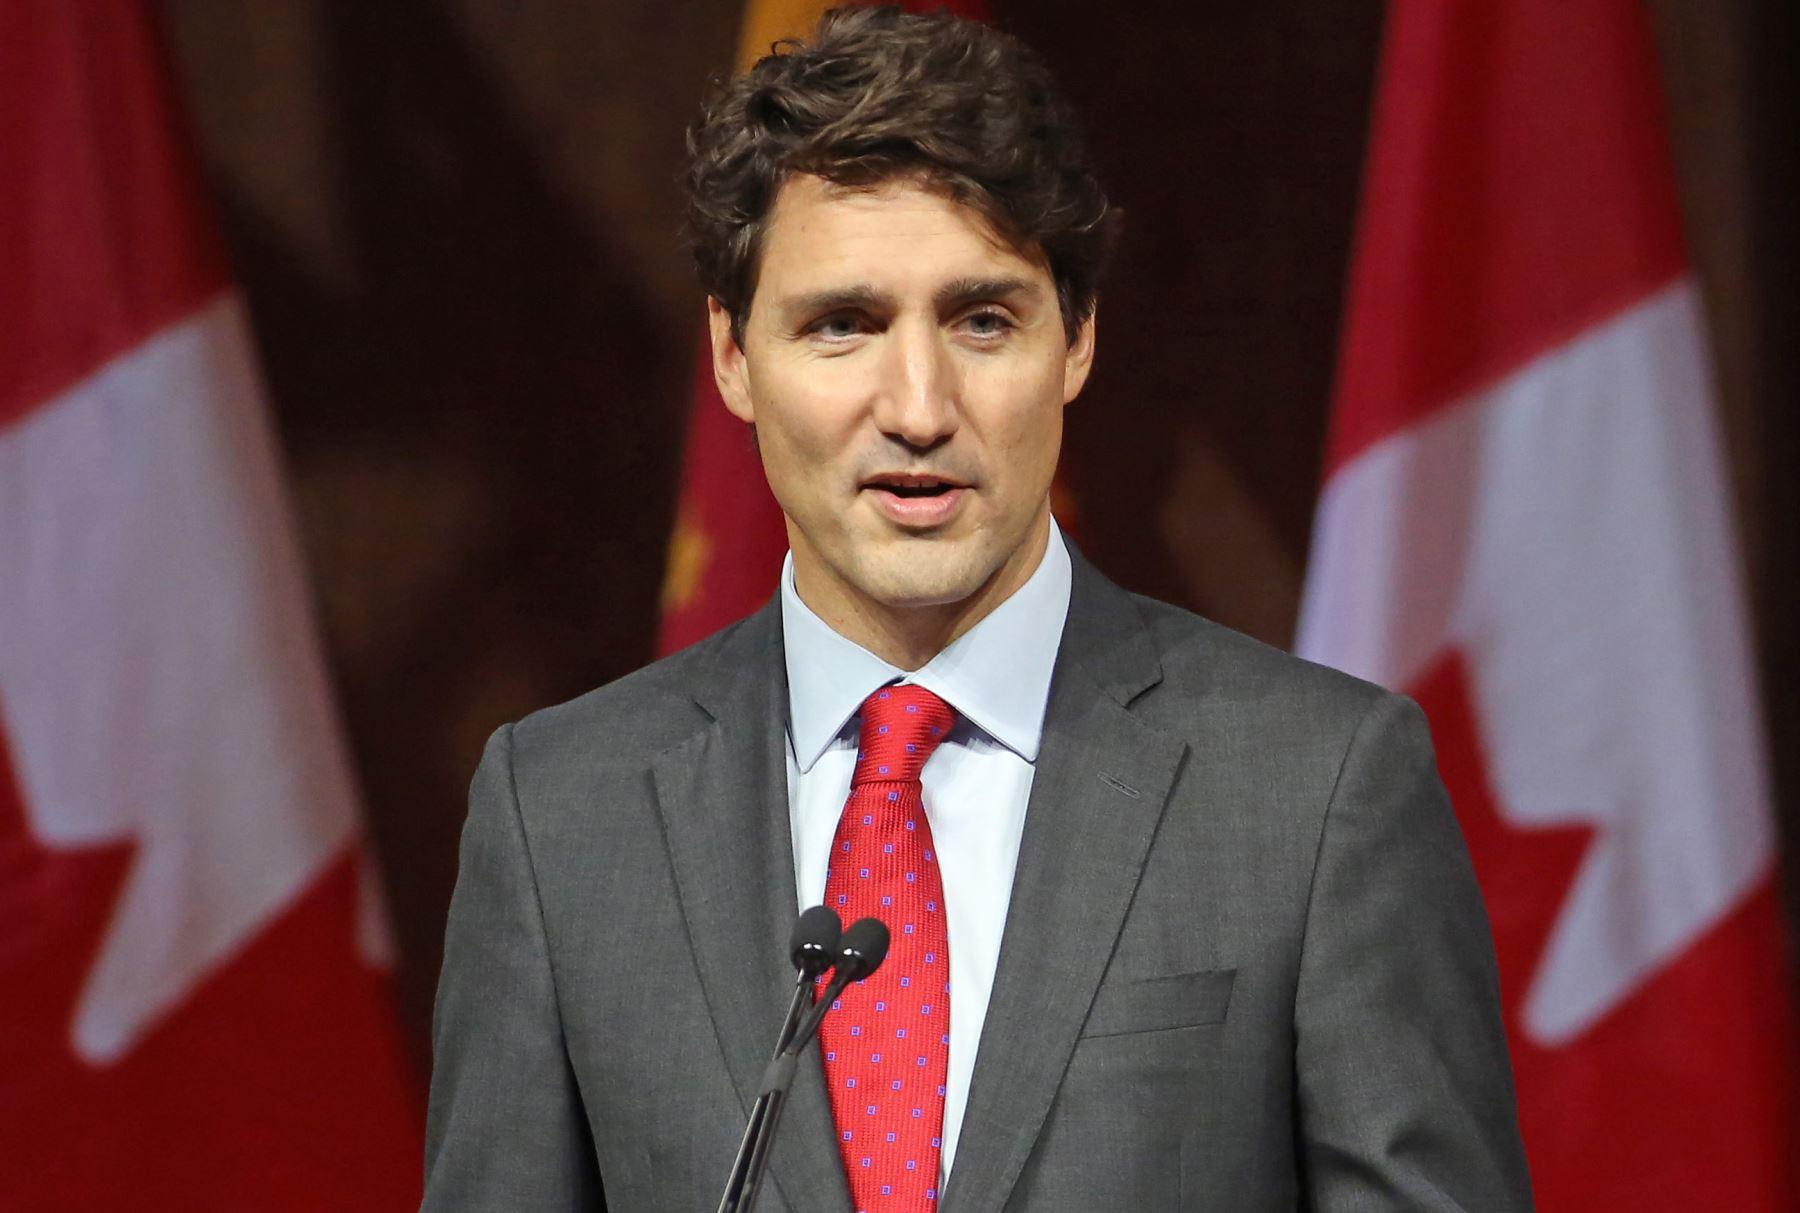 Cumbre de las Américas: Trudeau pide